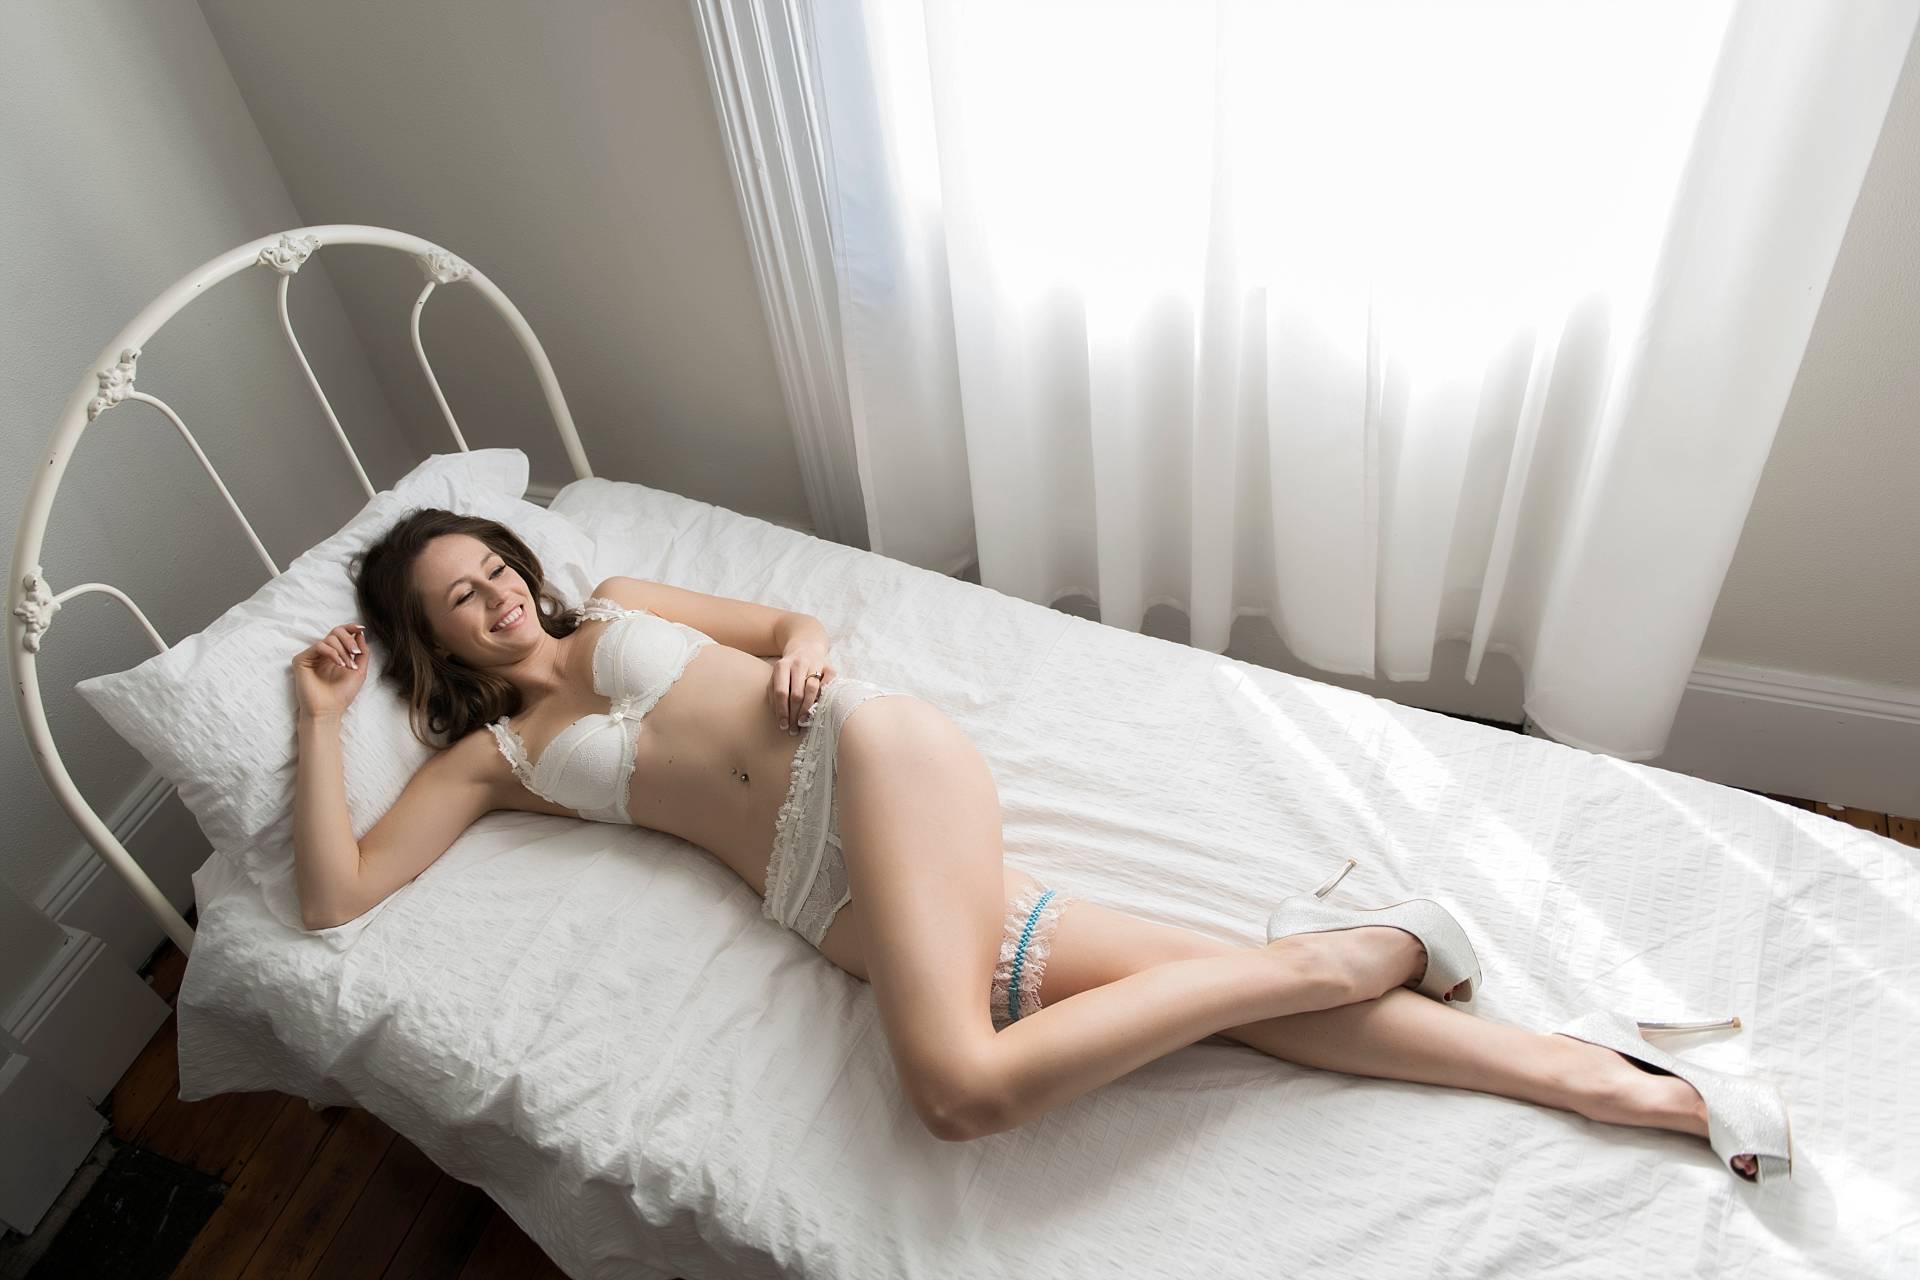 Sydney_Bridal_boudoir-03.jpg